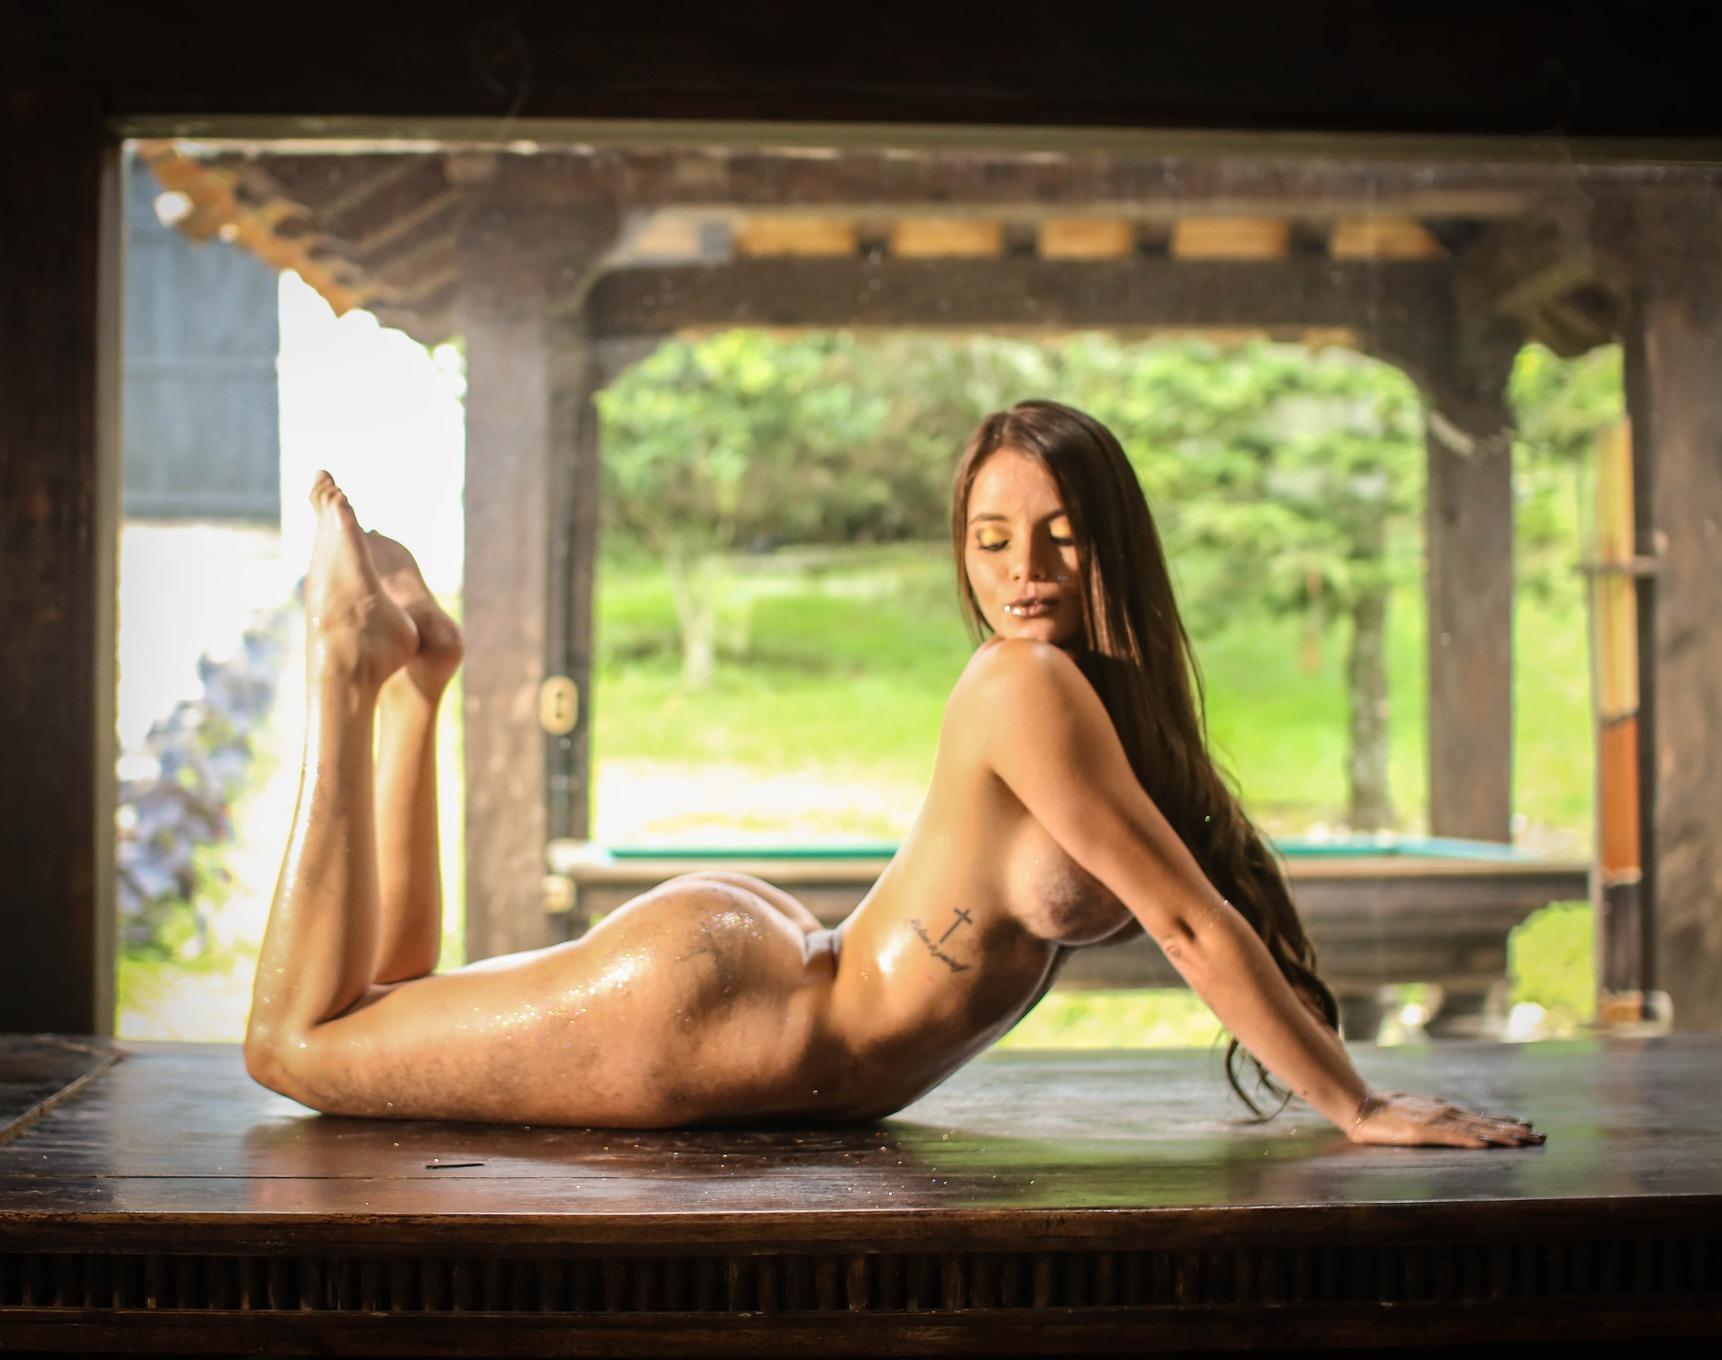 Pamela Jay Naked and Oiled nude pics - Bunnylust.com